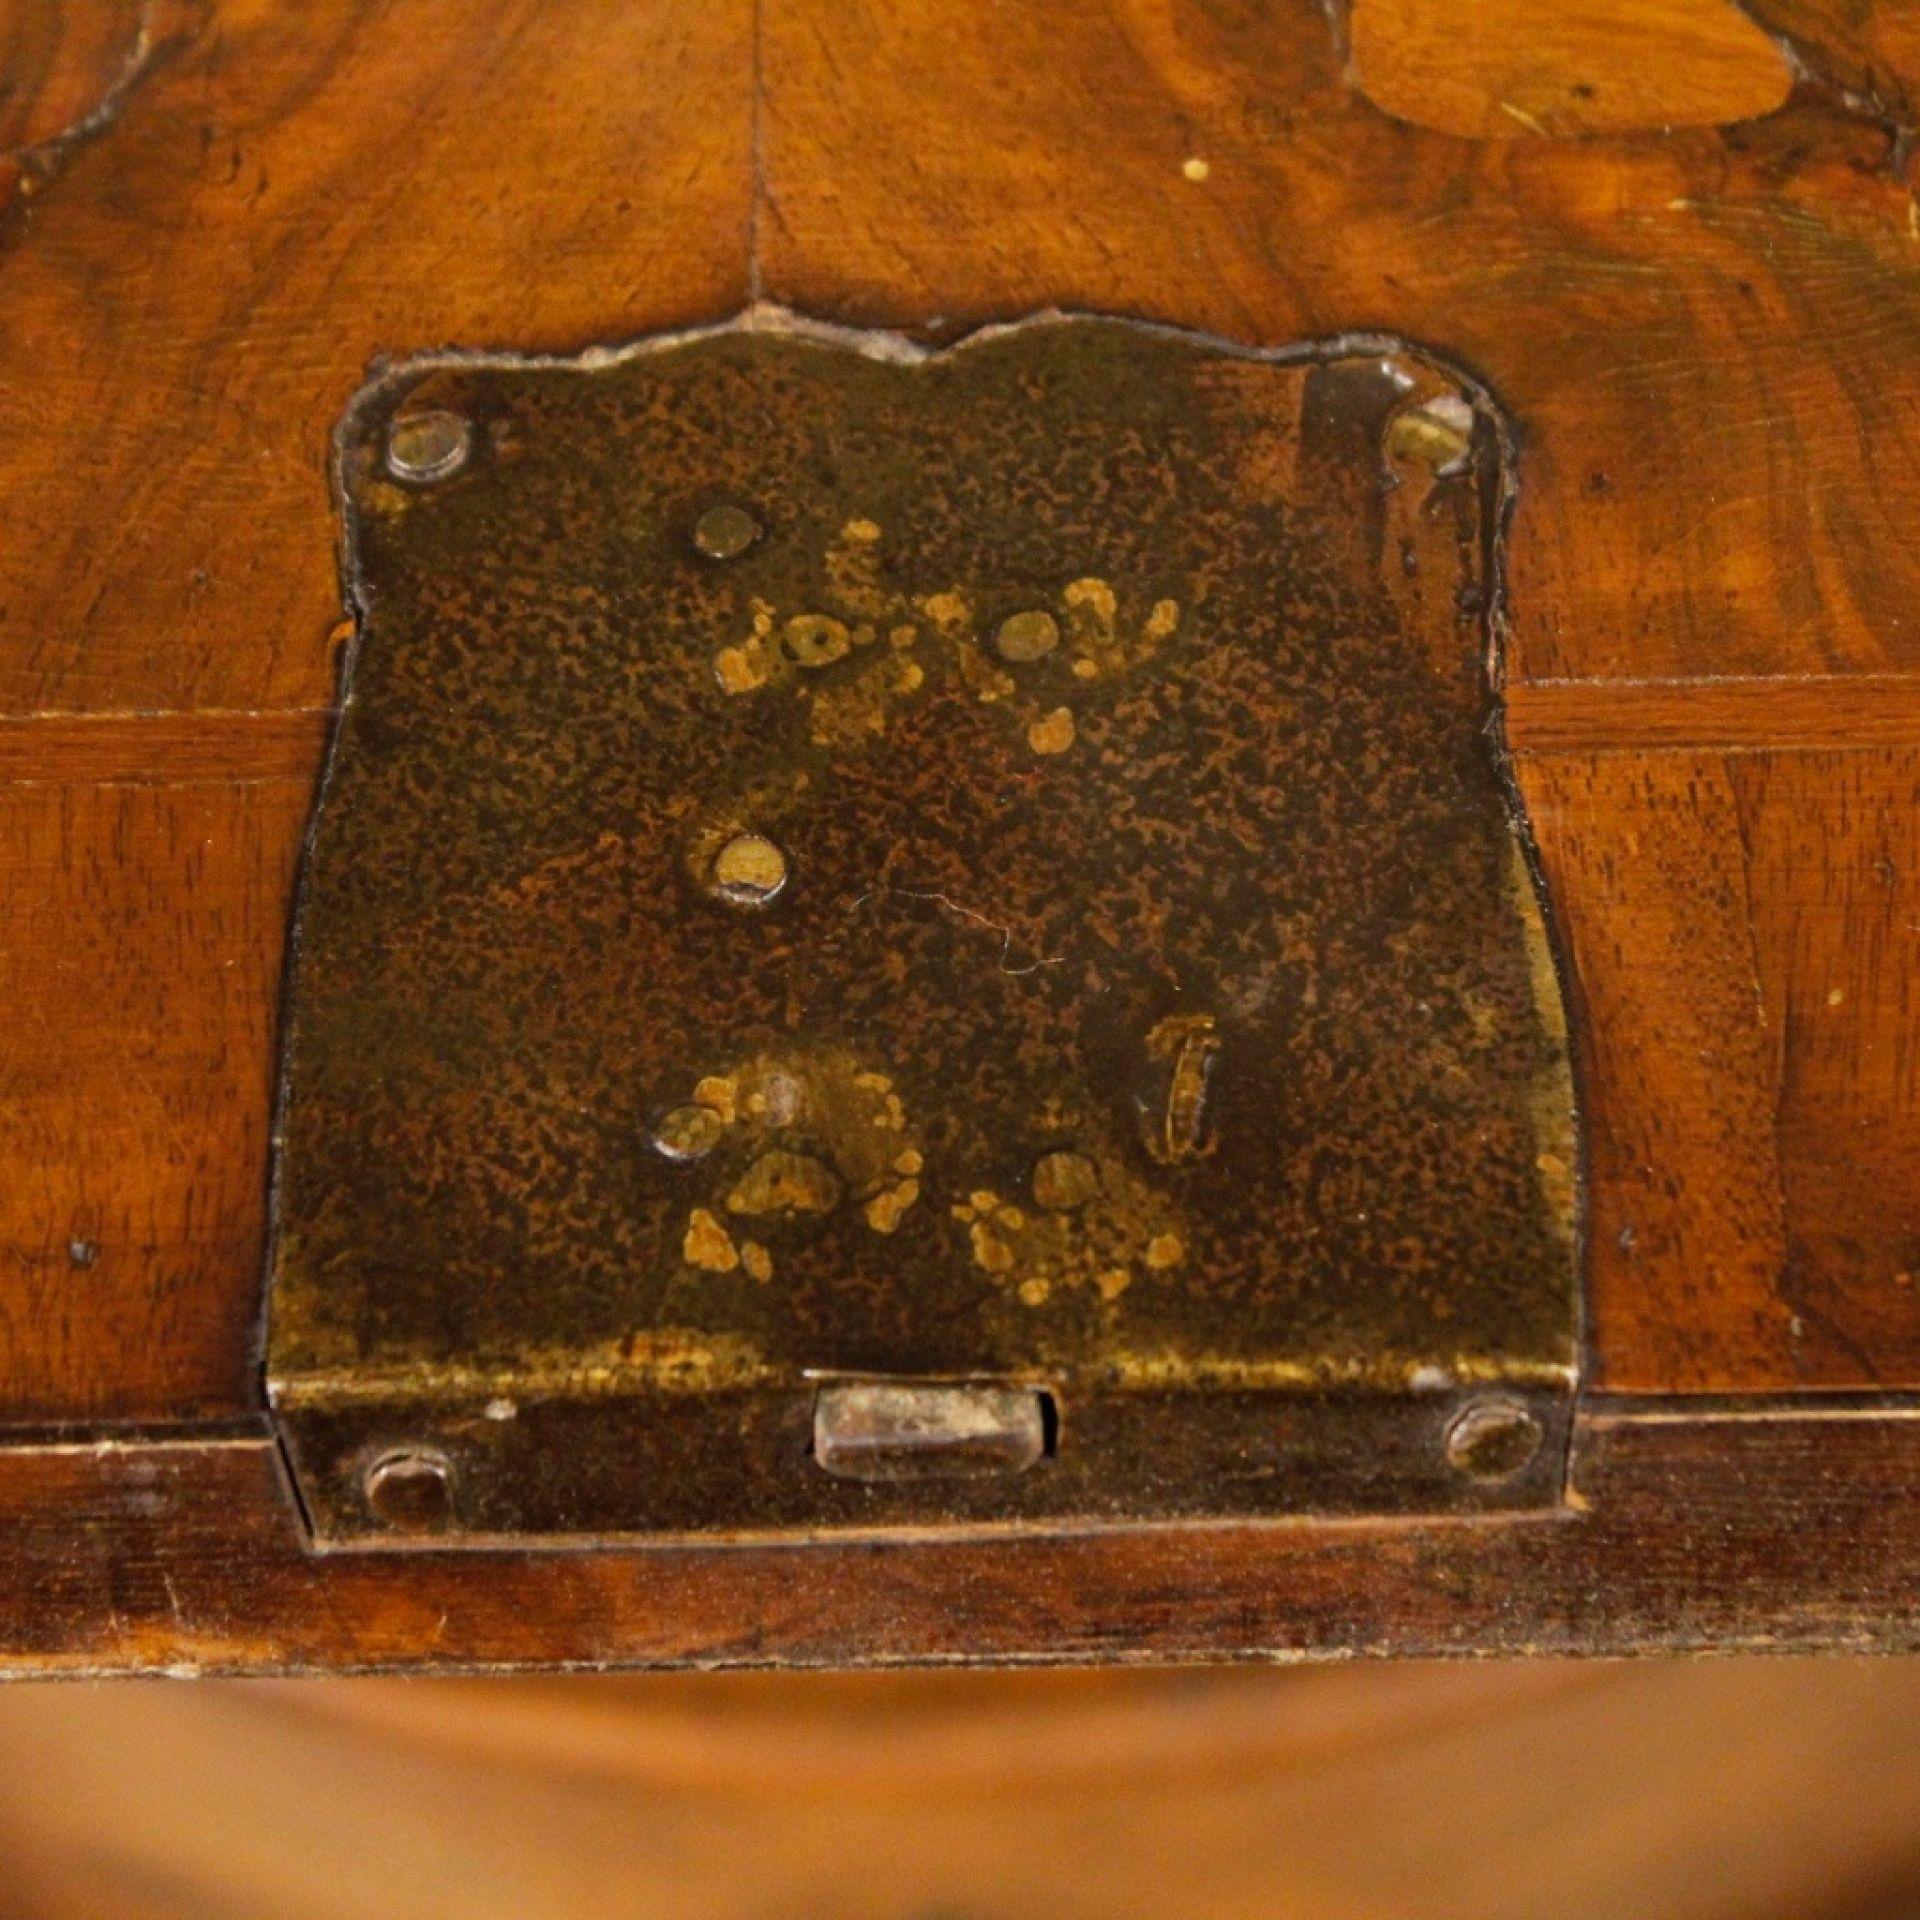 Venetian Bureau In Walnut, Mahogany And Burl Walnut From 20th Century